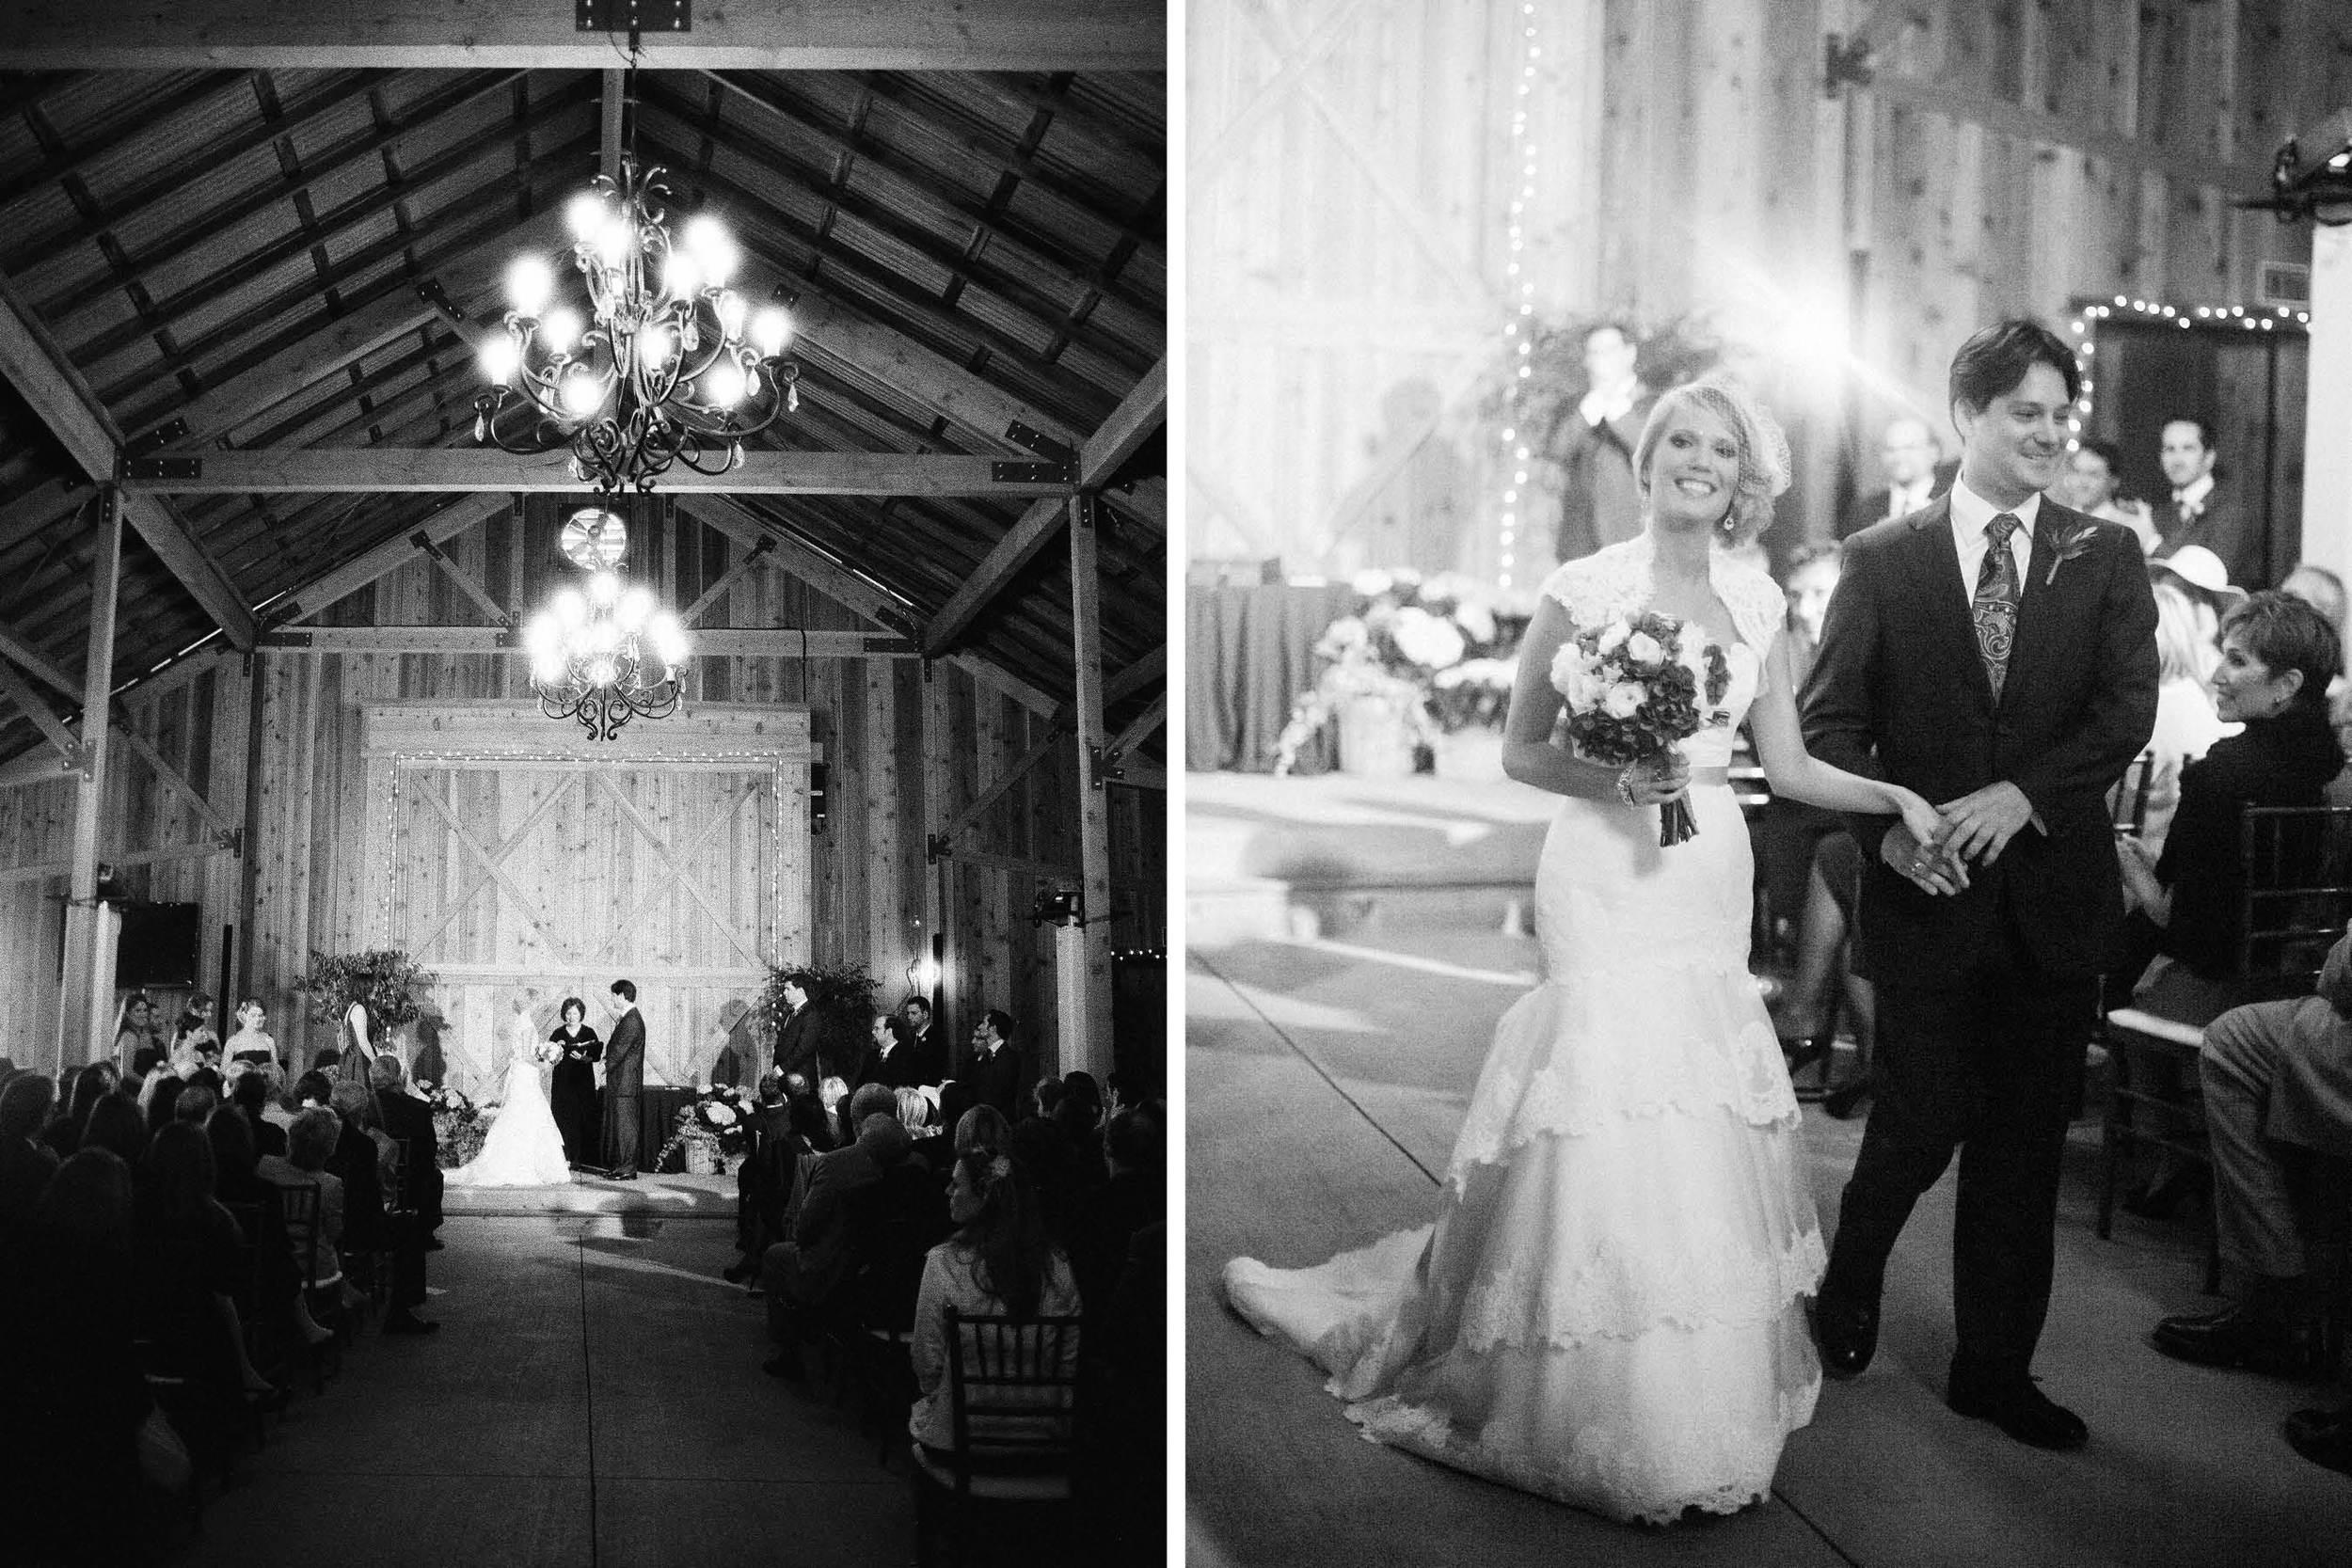 tres-hermanas-winery-vineyard-wedding-planner-coordinator-santa-barbara-ynez-maria (11).jpg